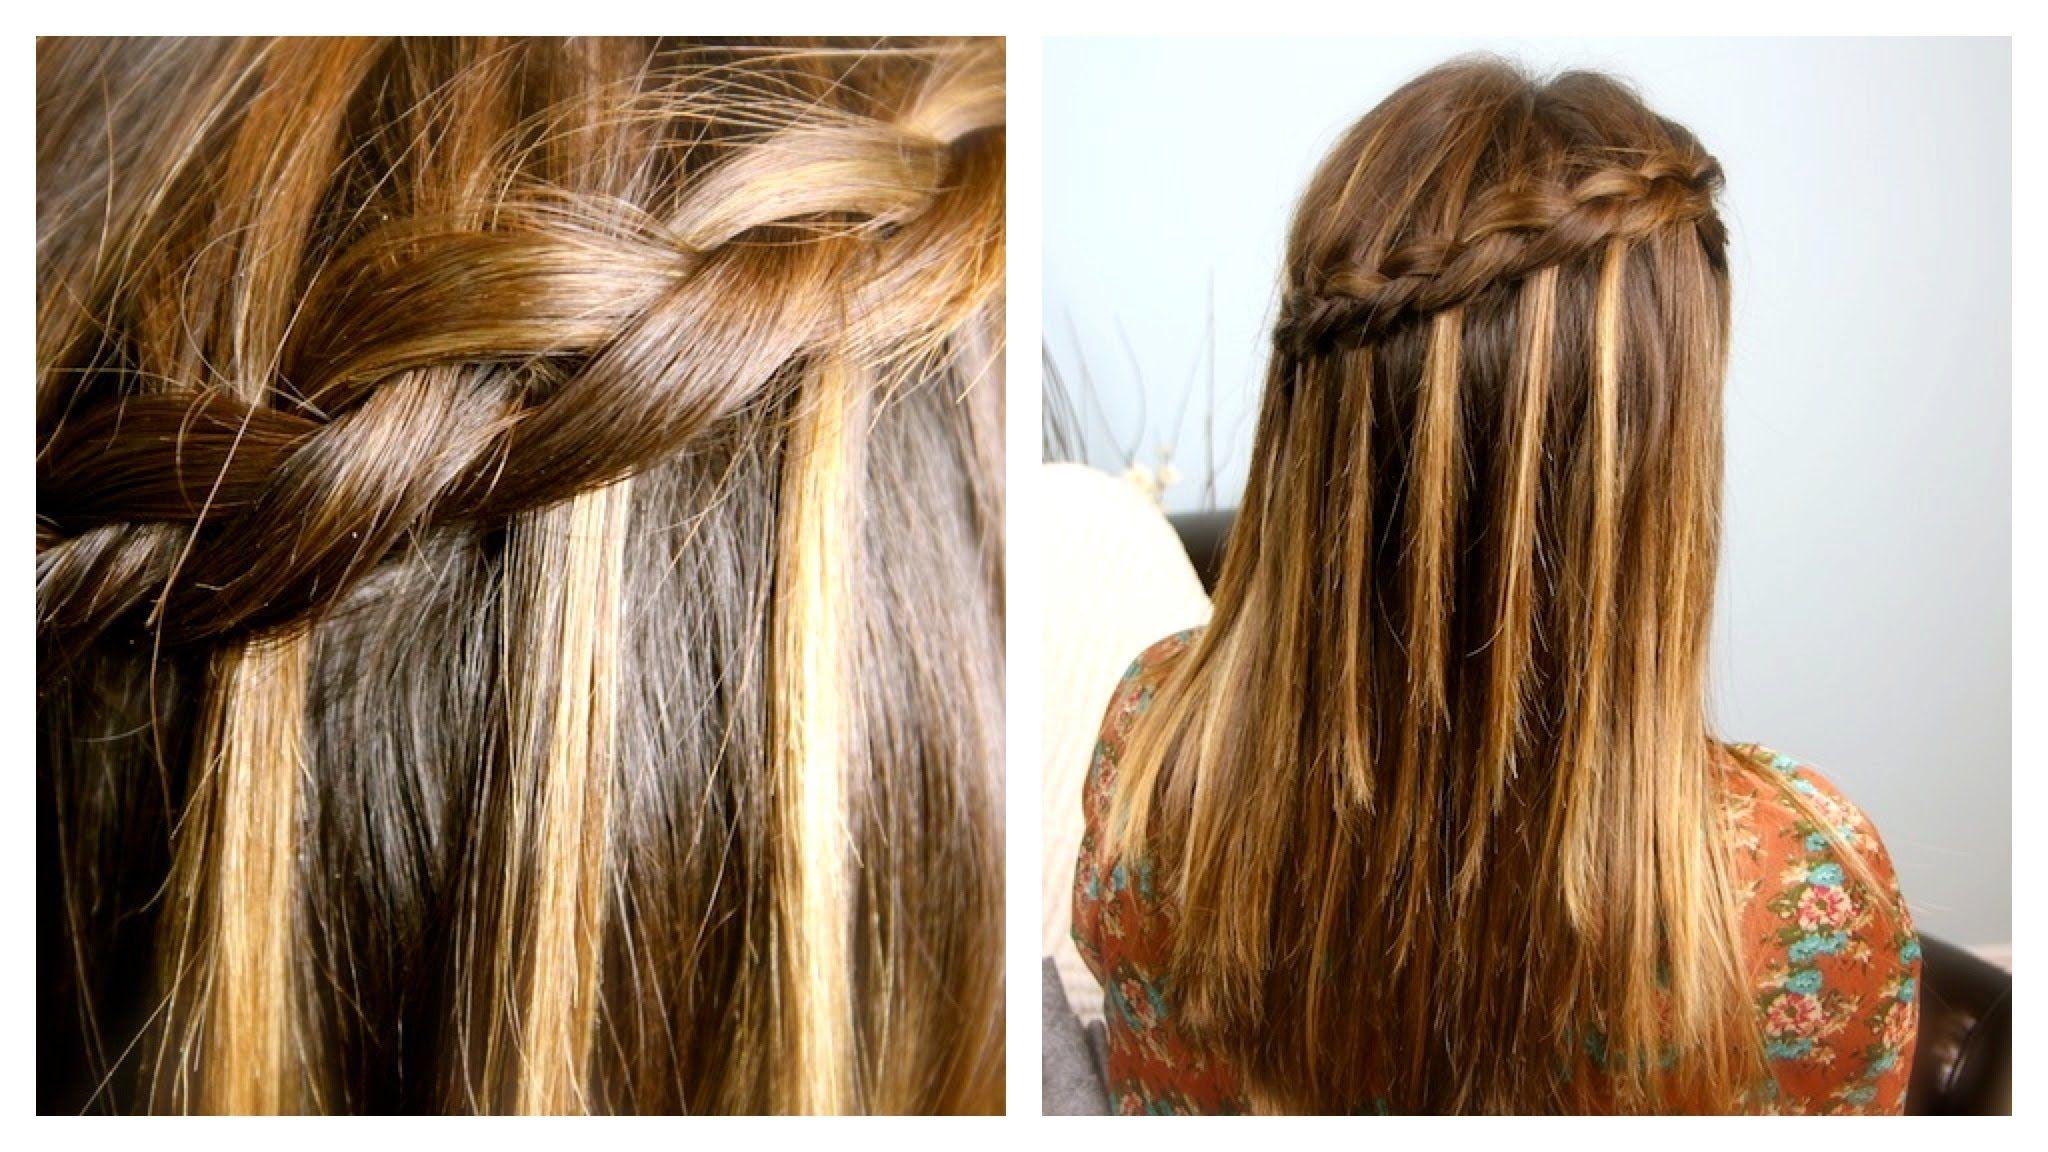 Diy dutch waterfall braid cute girls hairstyles shows how to do